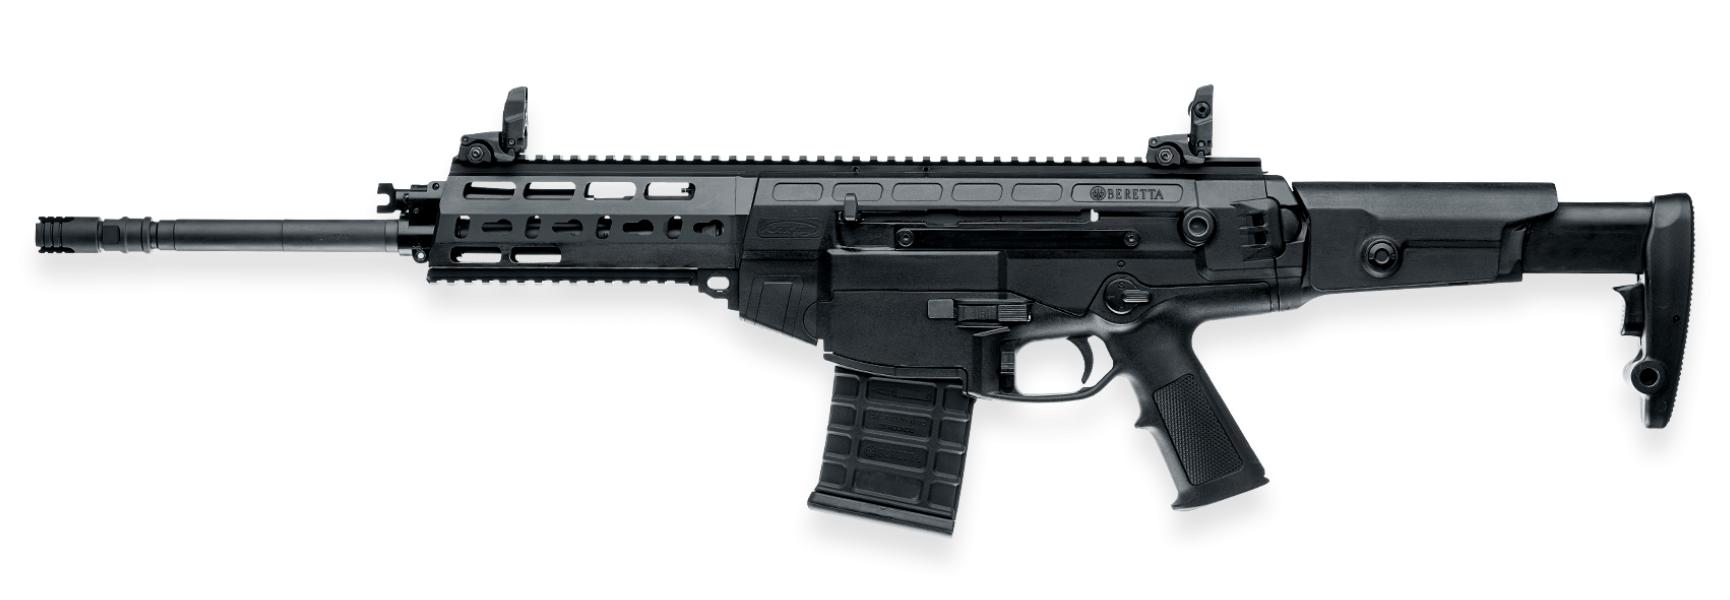 Видео: штурмовая винтовка   beretta arx-160